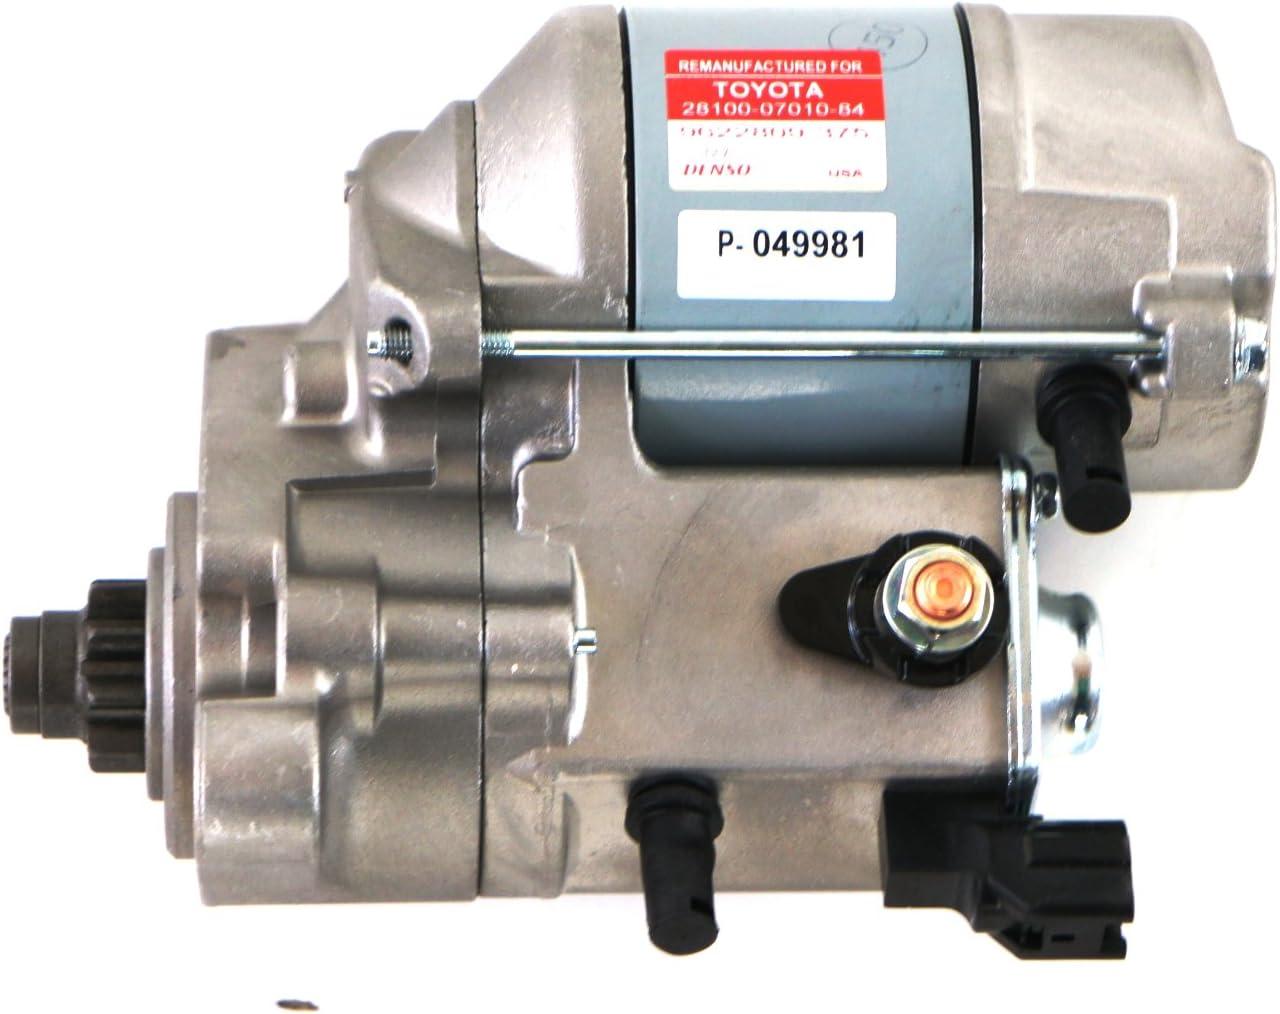 Genuine Toyota Parts 28100-07010-84 Remanufactured Starter for Toyota T100 V6//Tacoma V6//Tundra V6